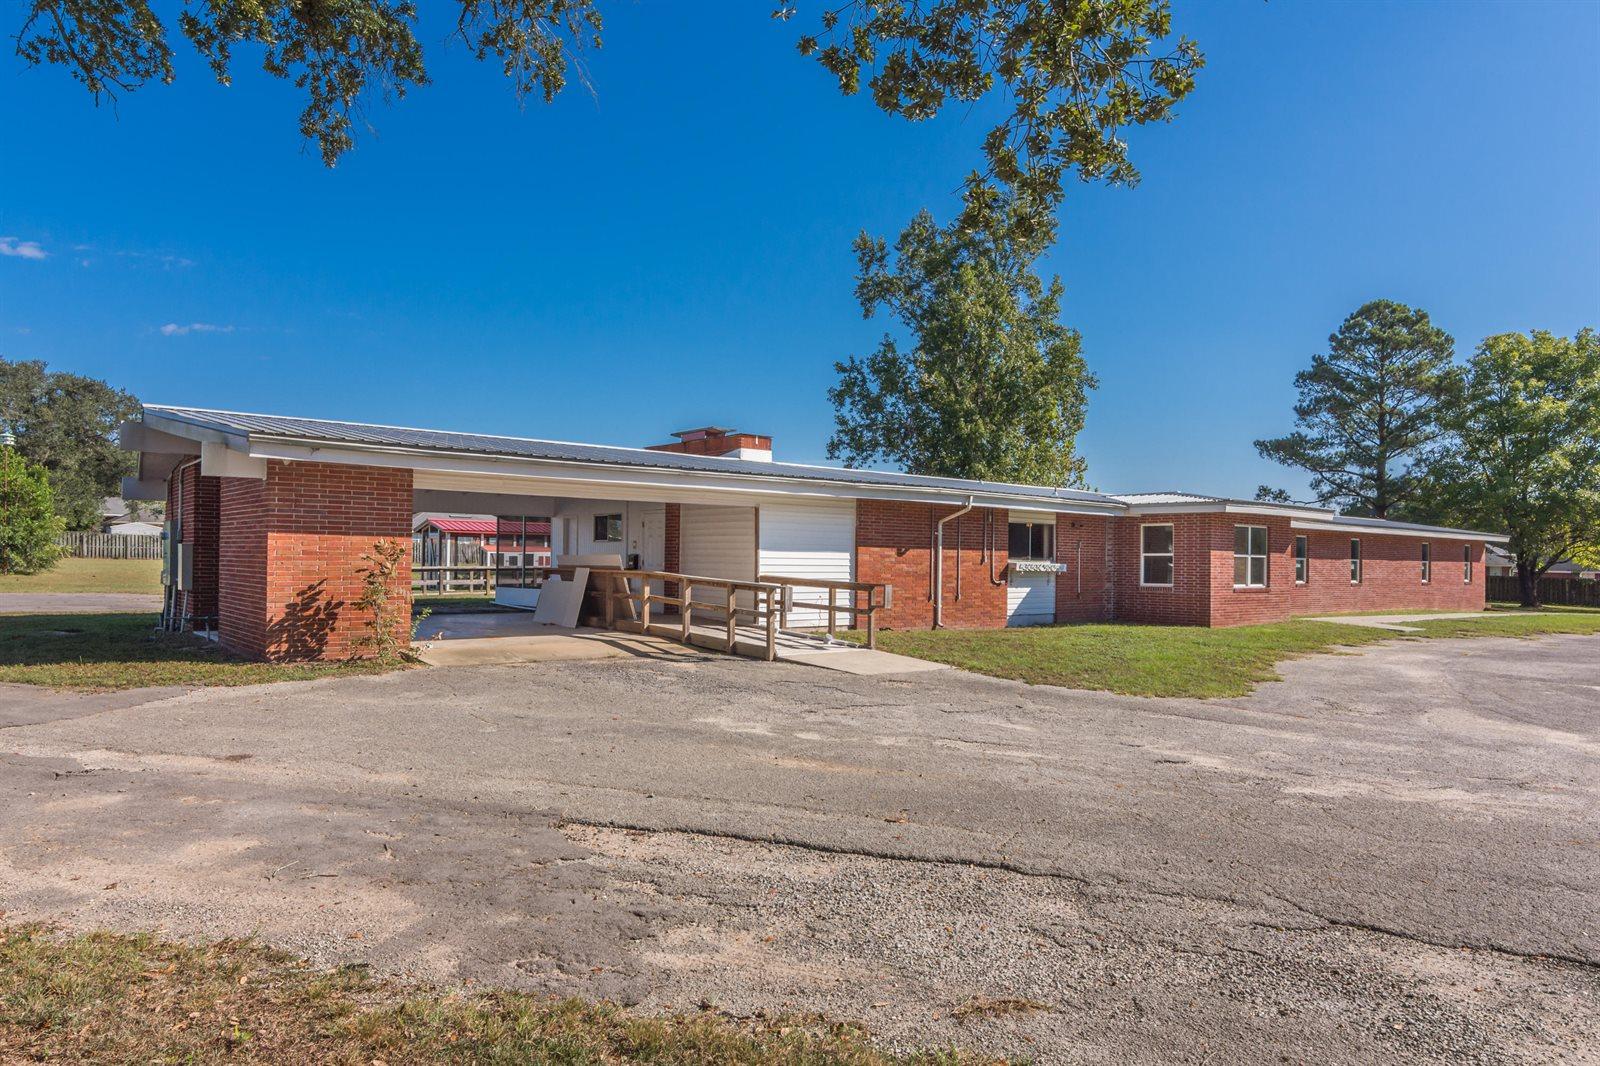 2301 West James Lee Boulevard, Crestview, FL 32536